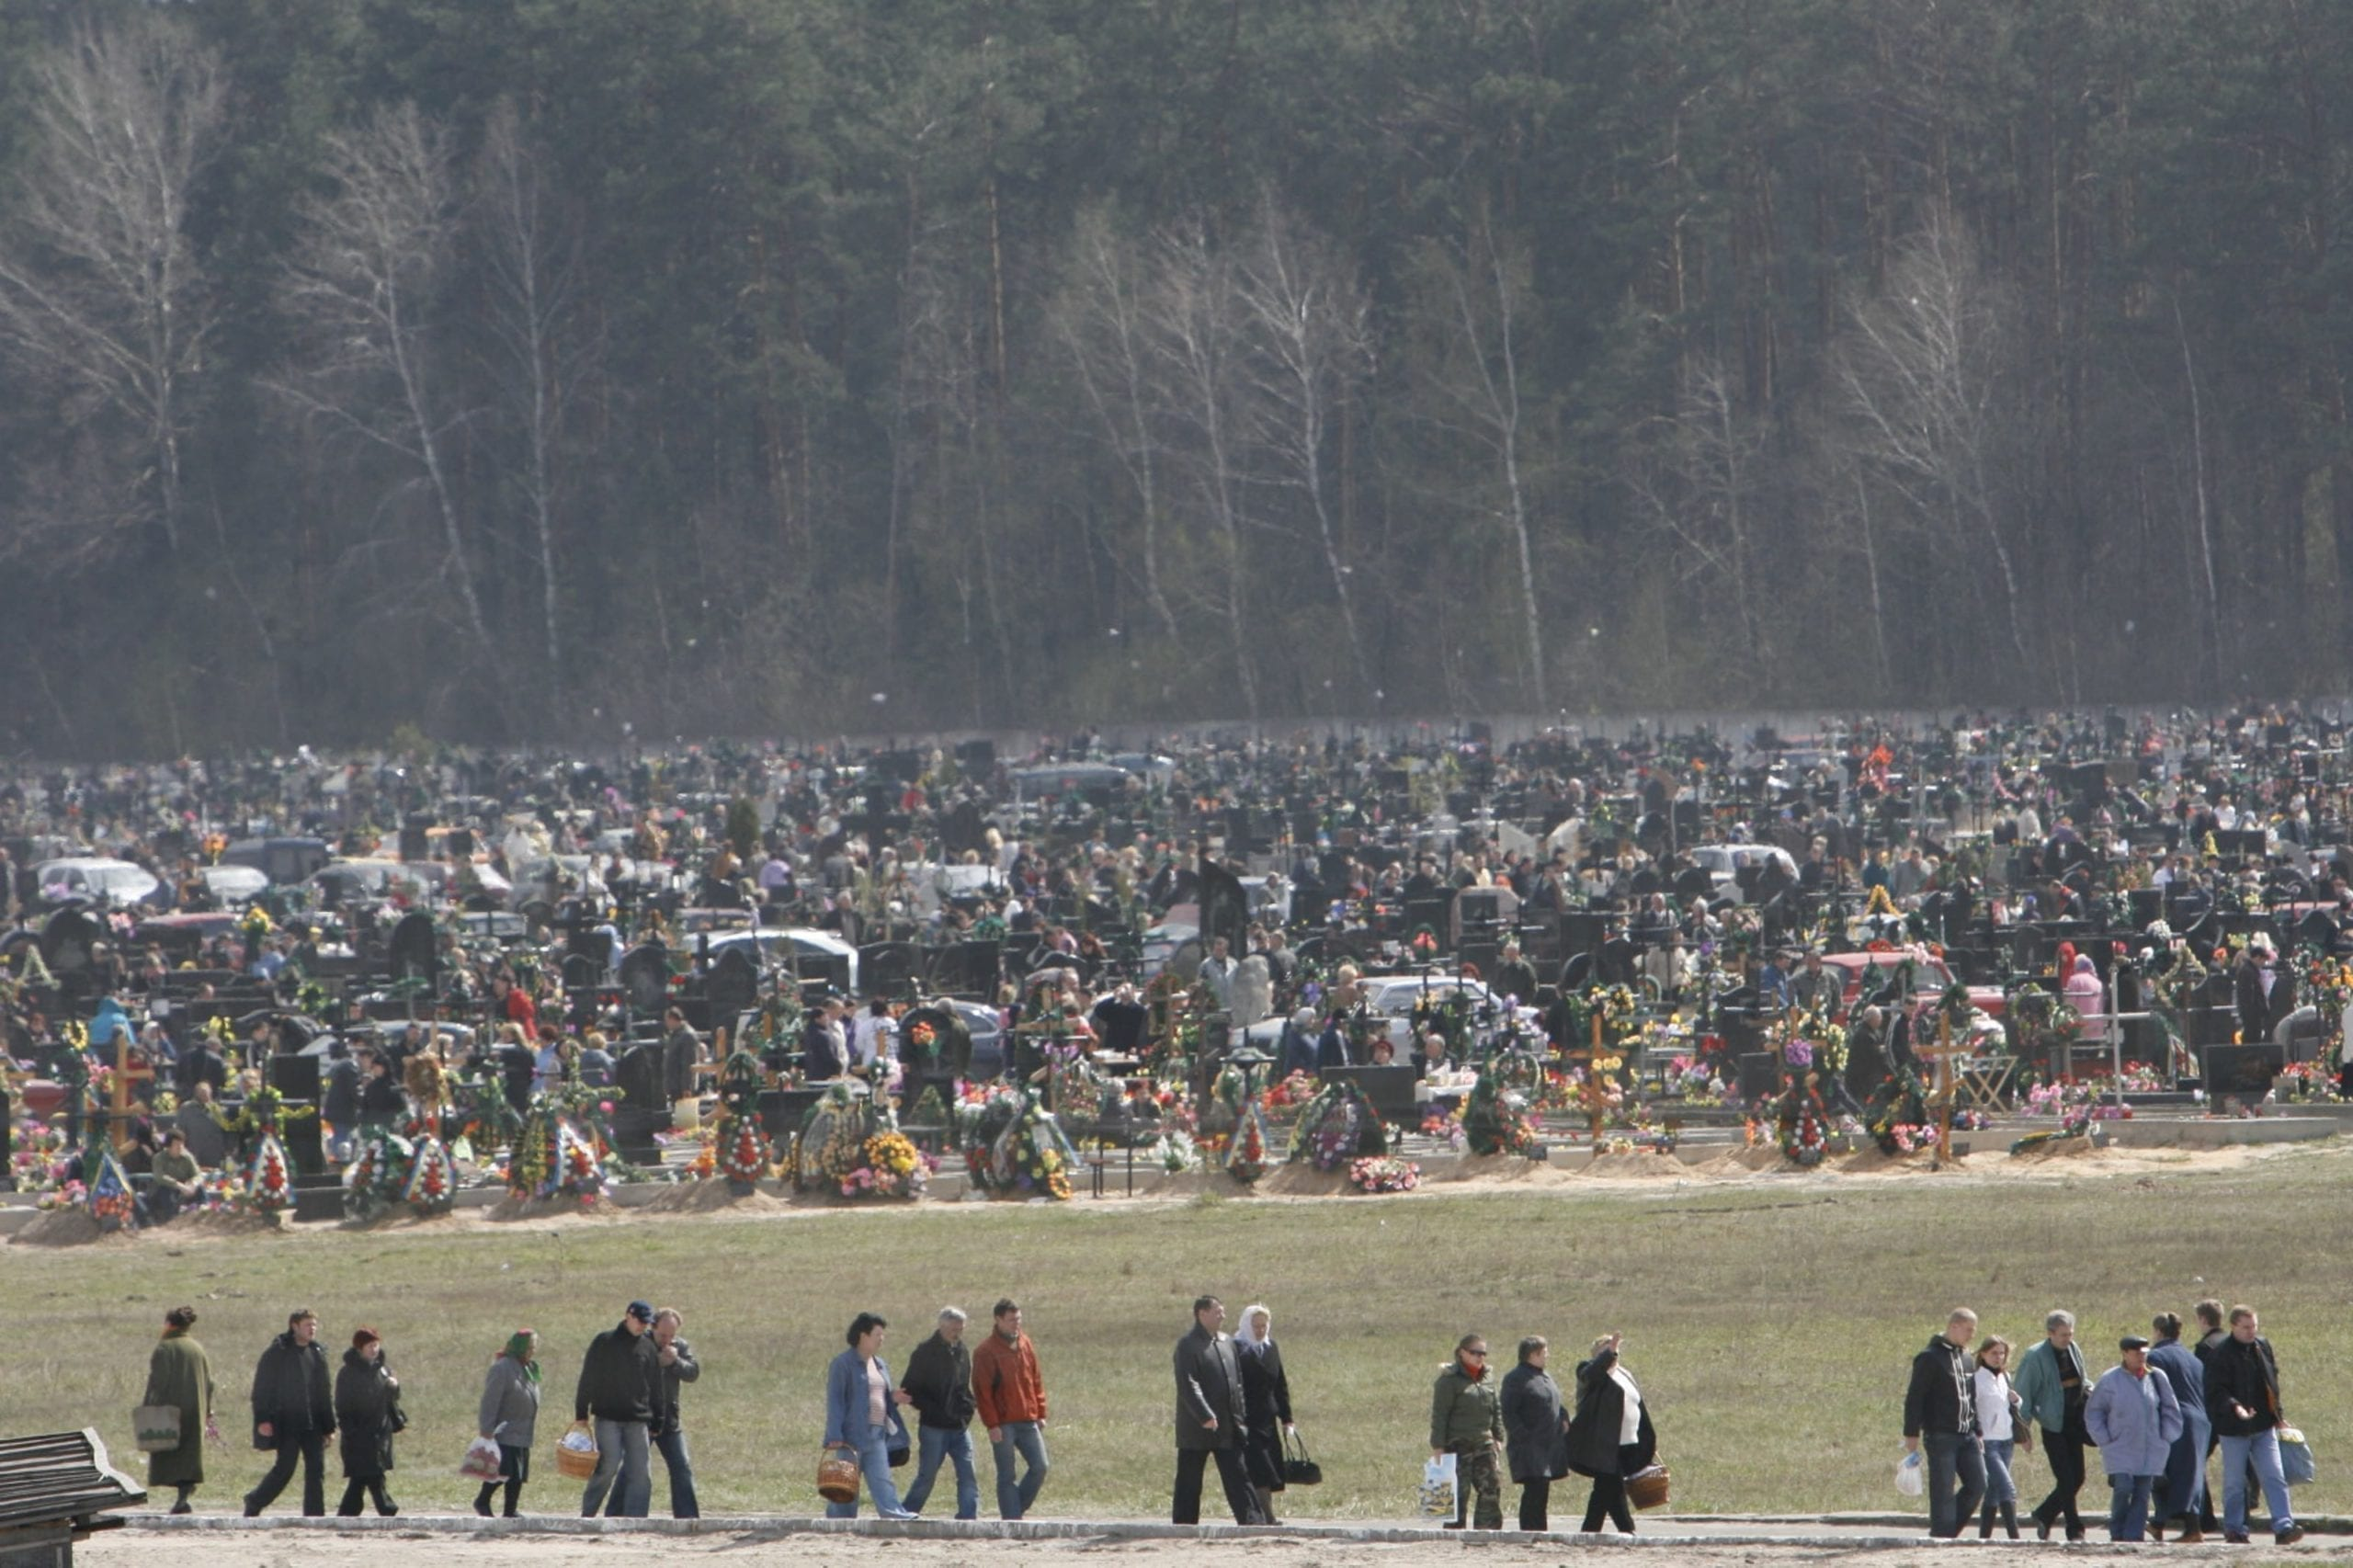 kostyantin chernichkin 01 scaled - <b>В Украине проходят Гробки, когда люди устраивают трапезы на кладбищах.</b> Объясняем, что это за традиция - Заборона